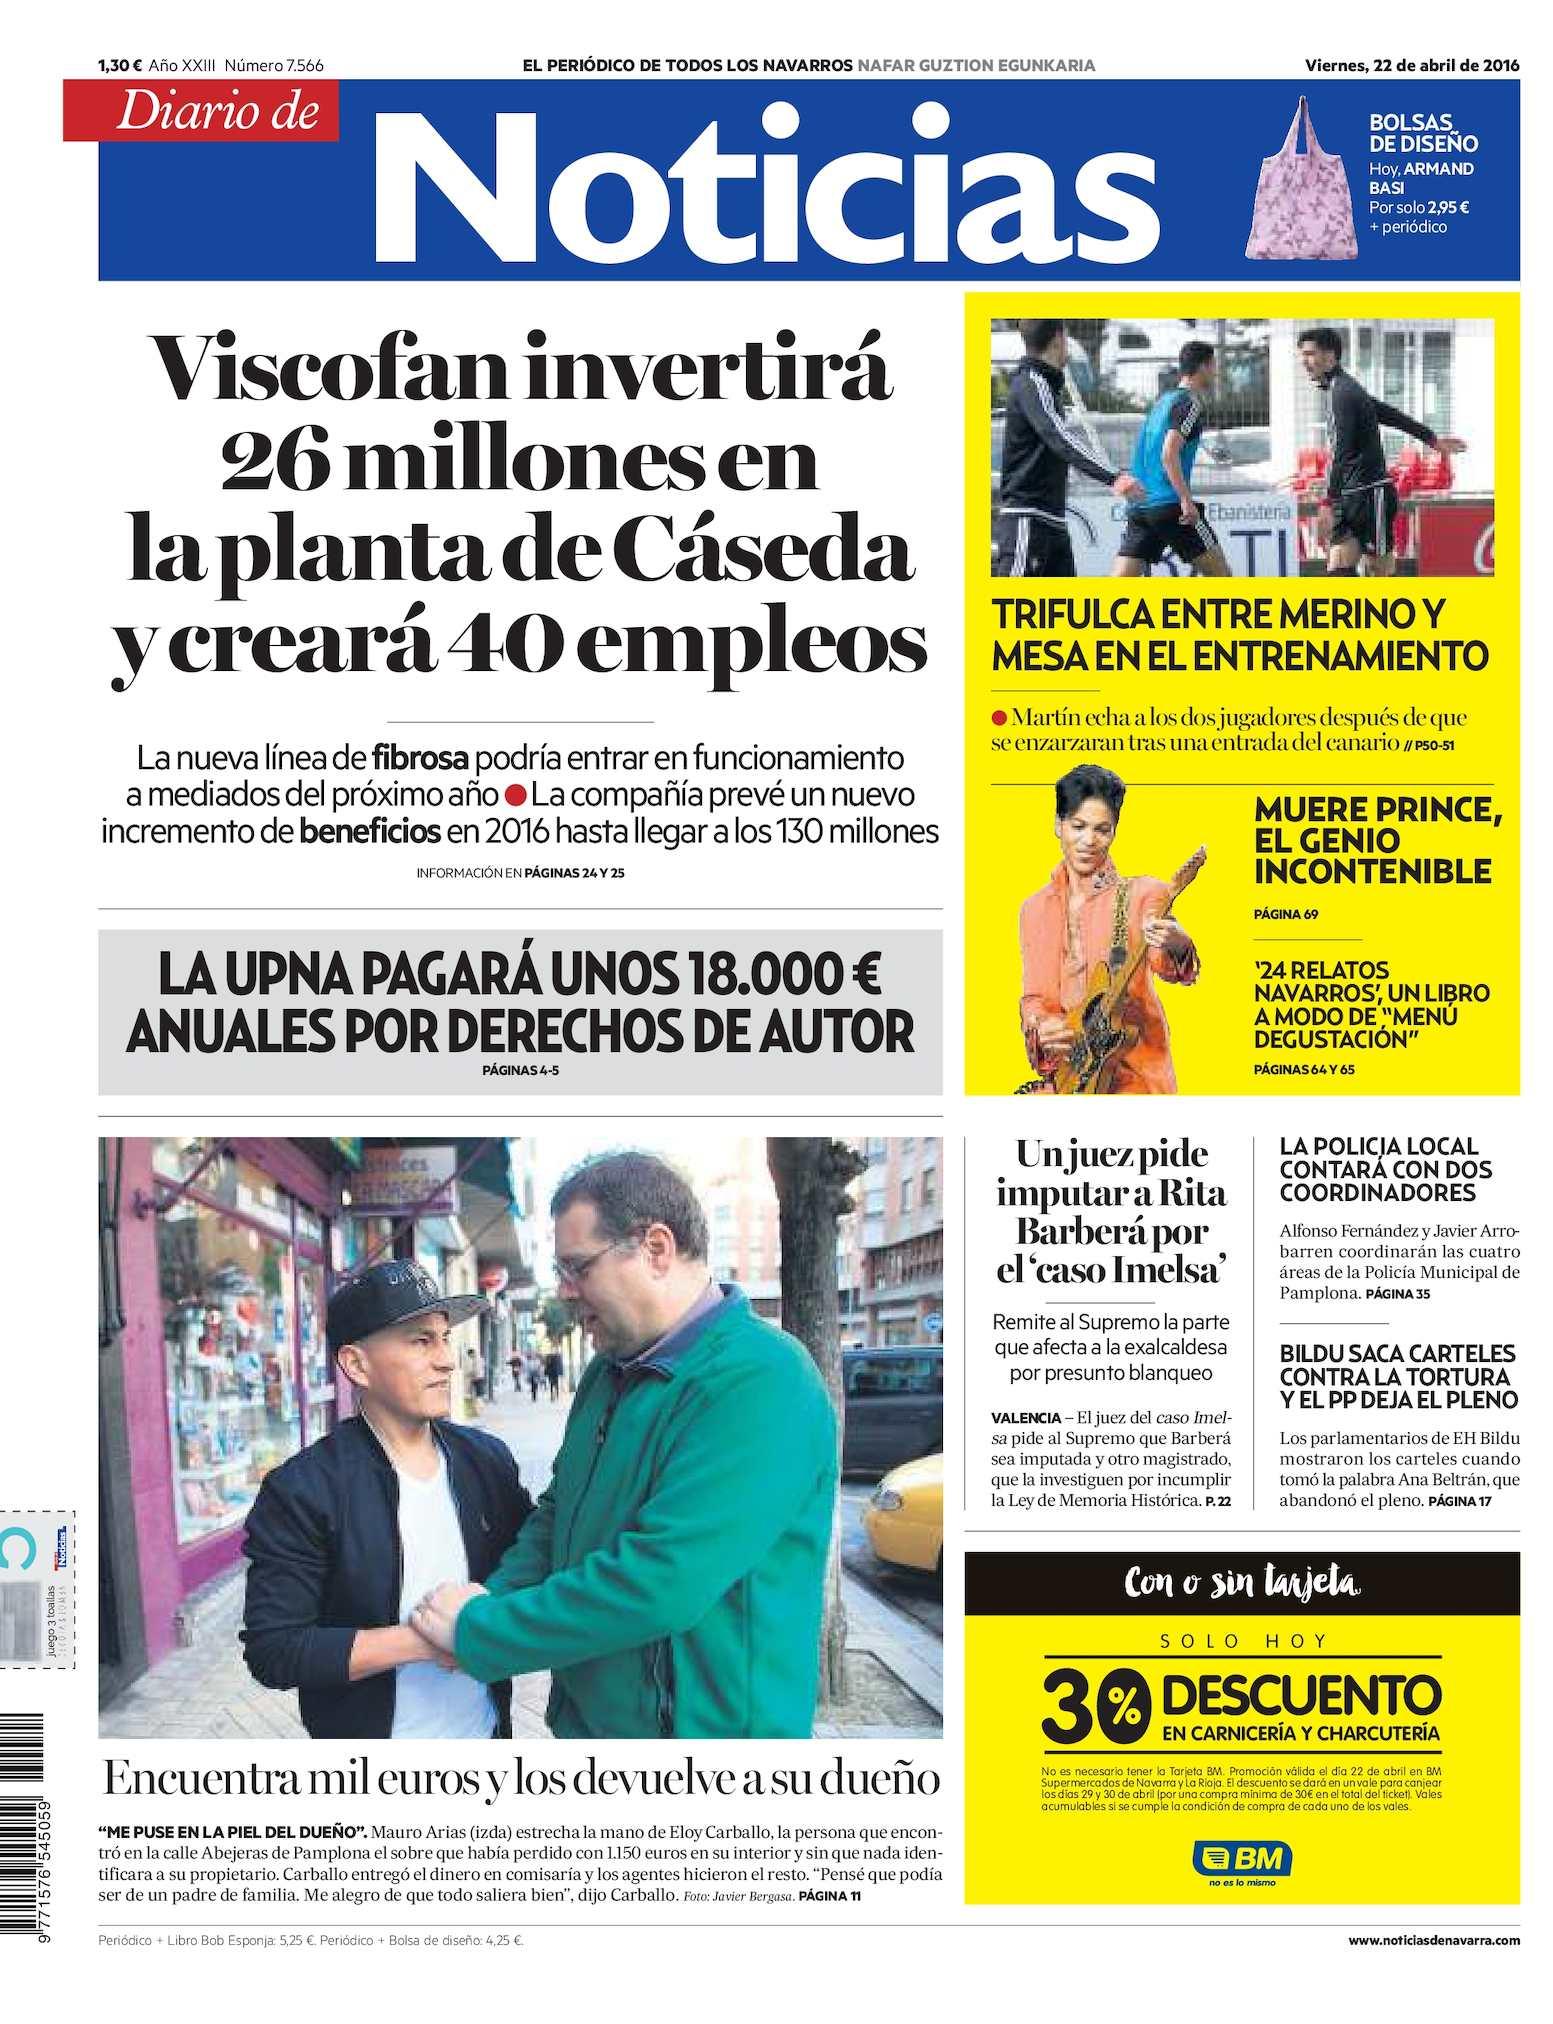 Agencias matrimoniales Asturias chupo rroco